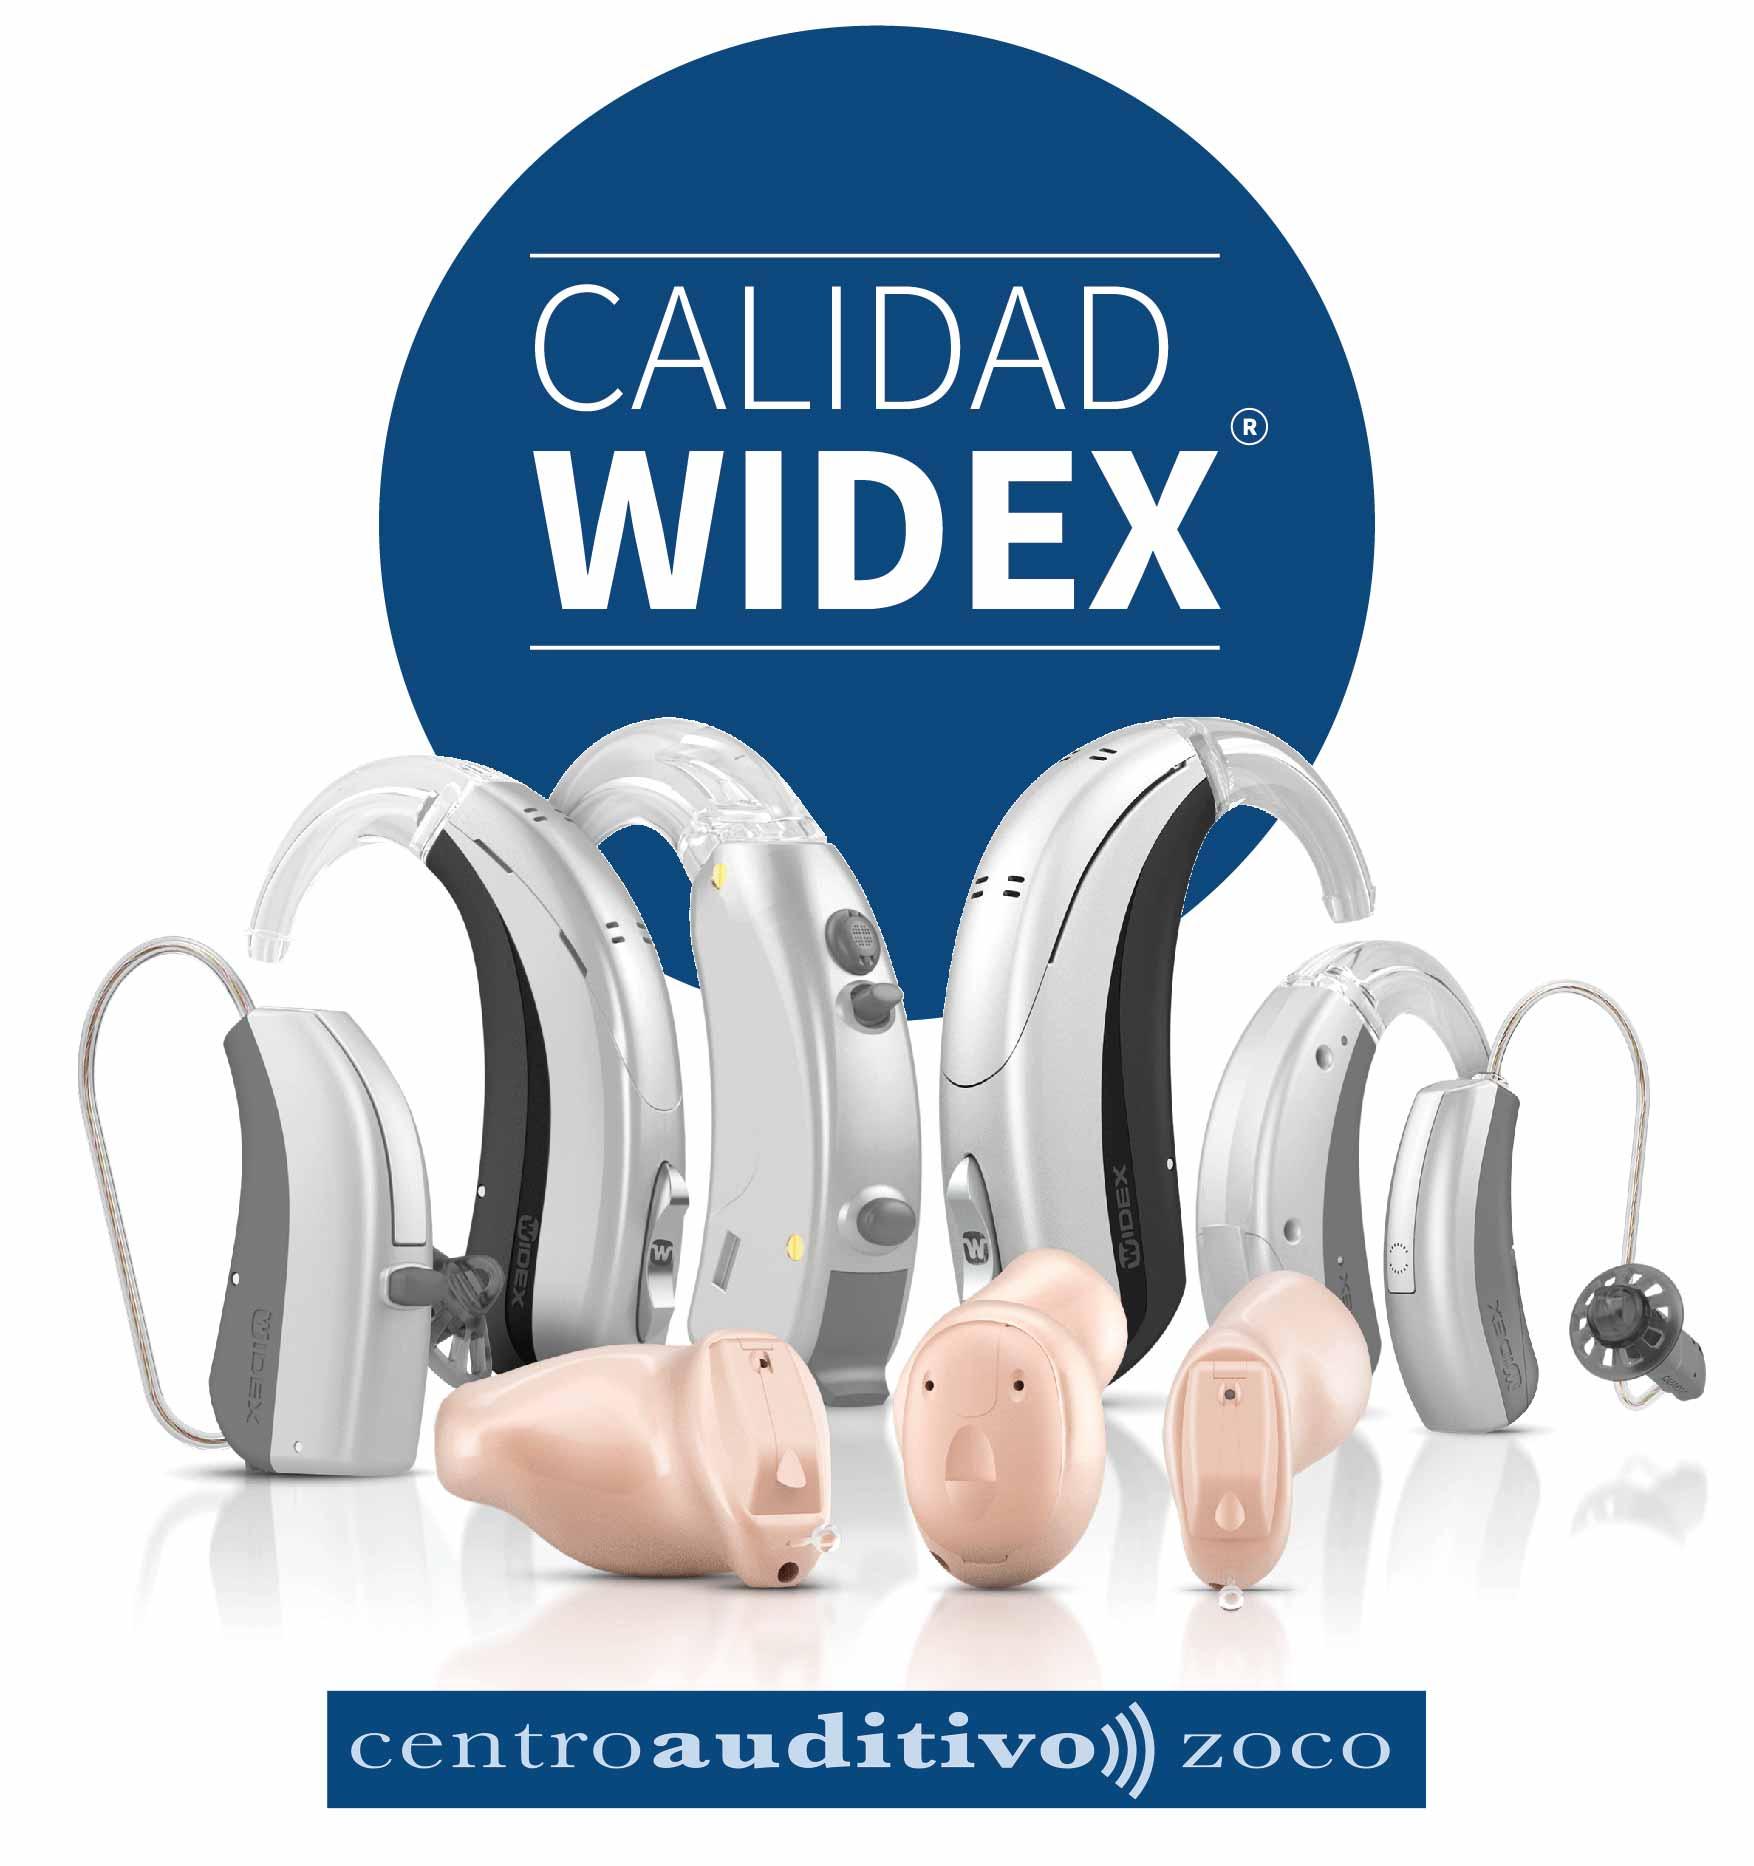 Audífono Oticon azul